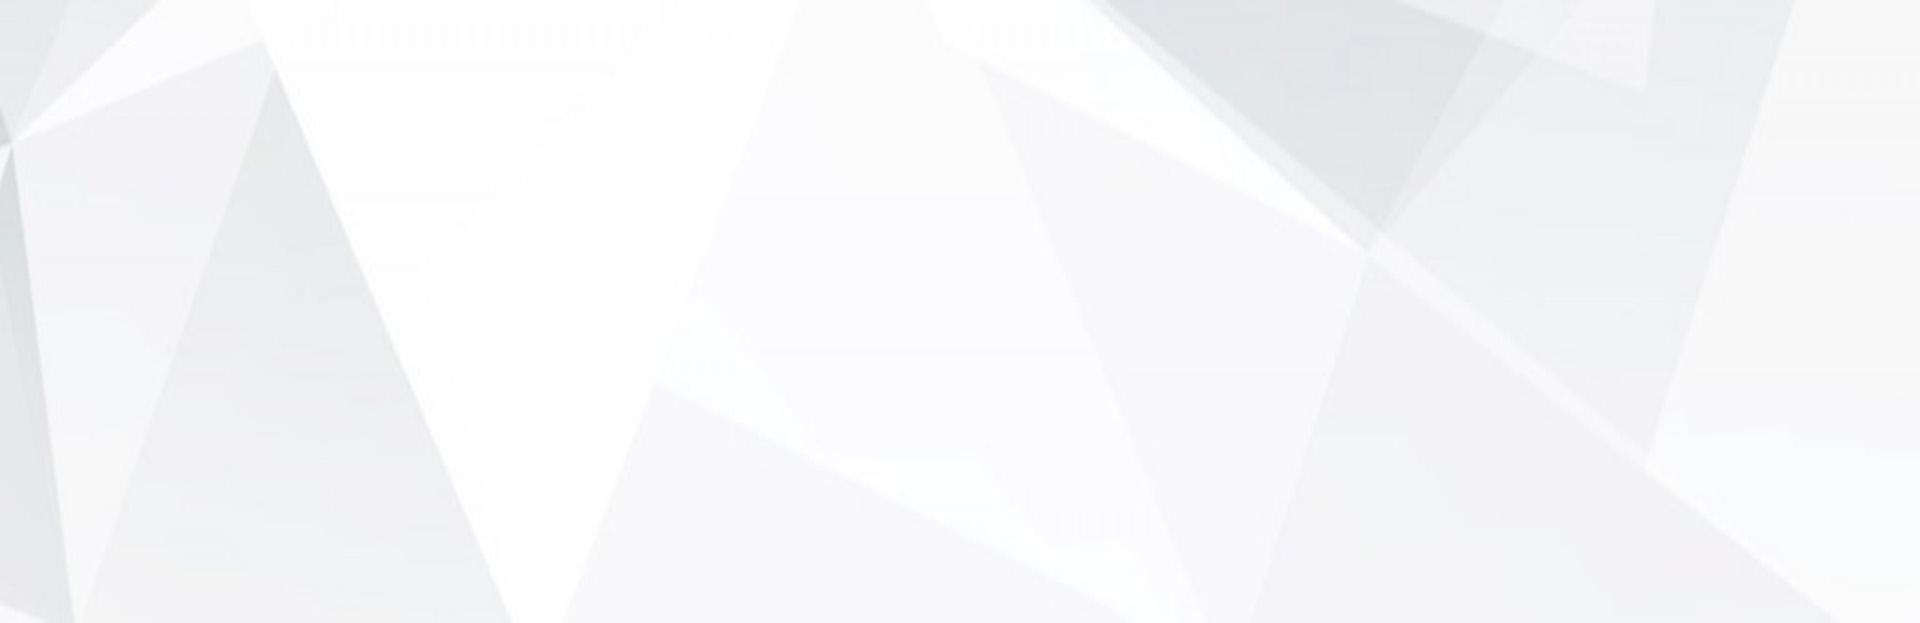 TPA/Self Insured Slider